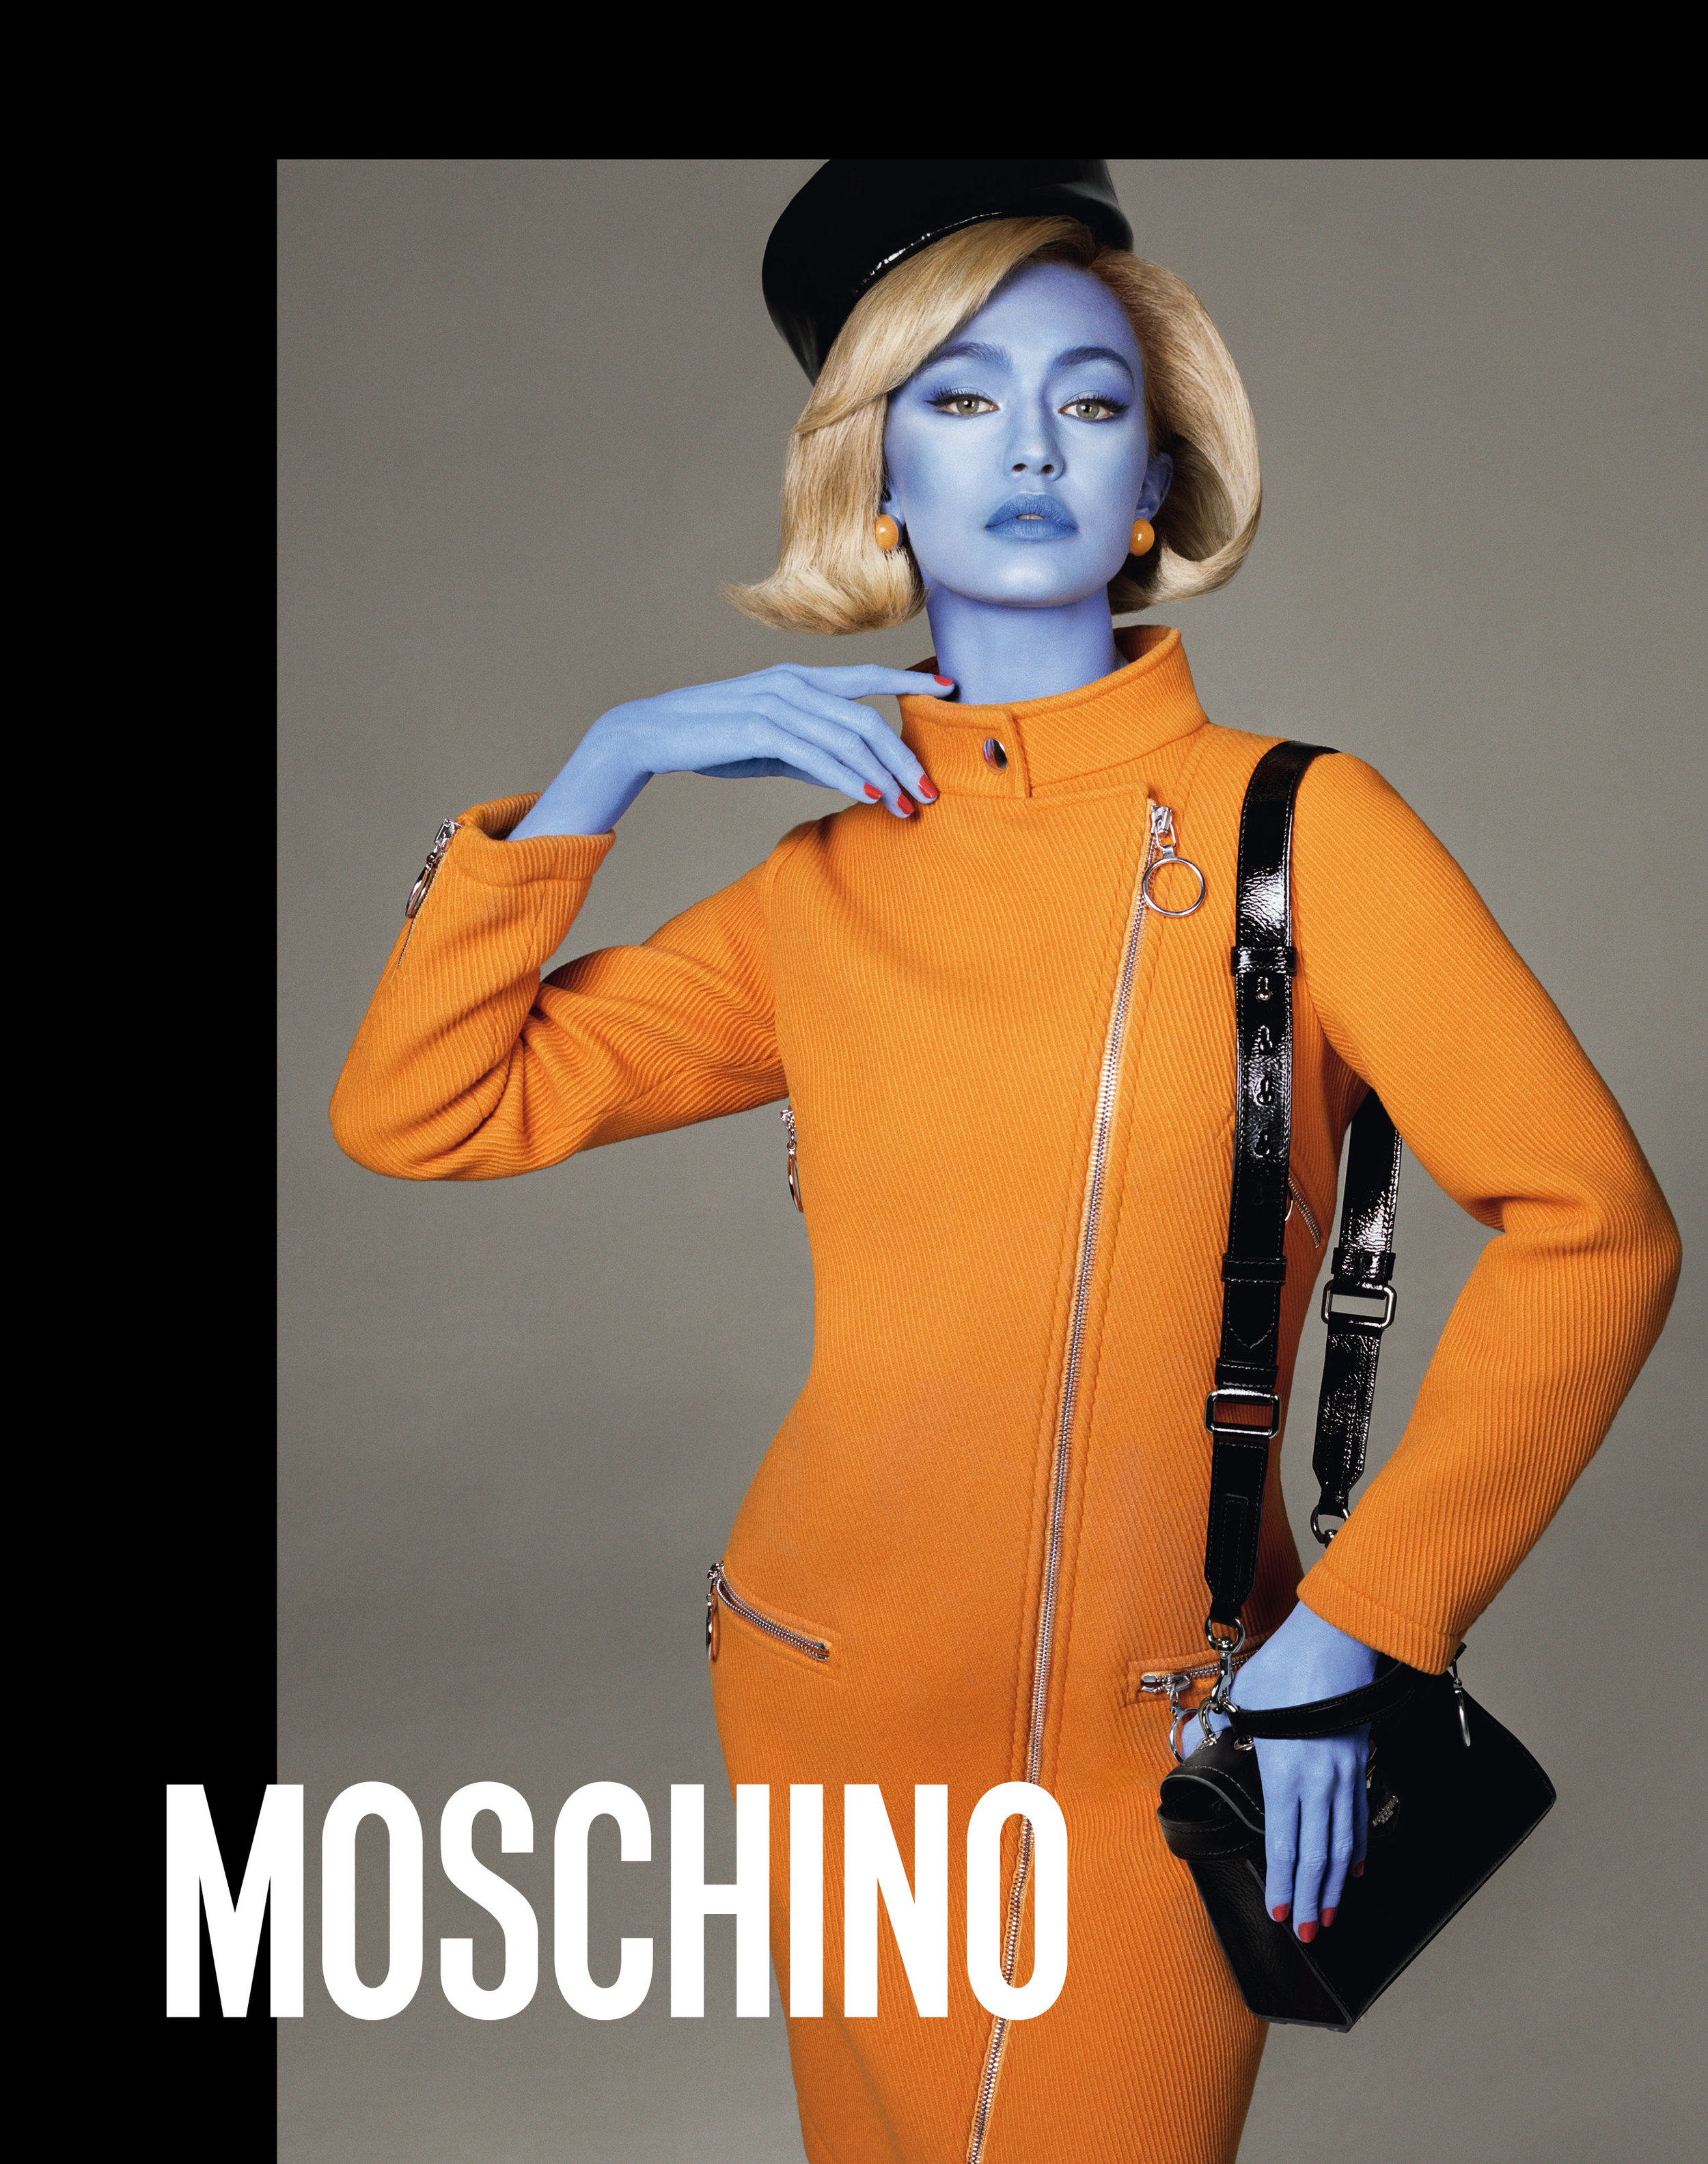 Moschino_1_fa_moschino_fw_18_19_adv_campaign_images_-_gigi_hadid.jpg